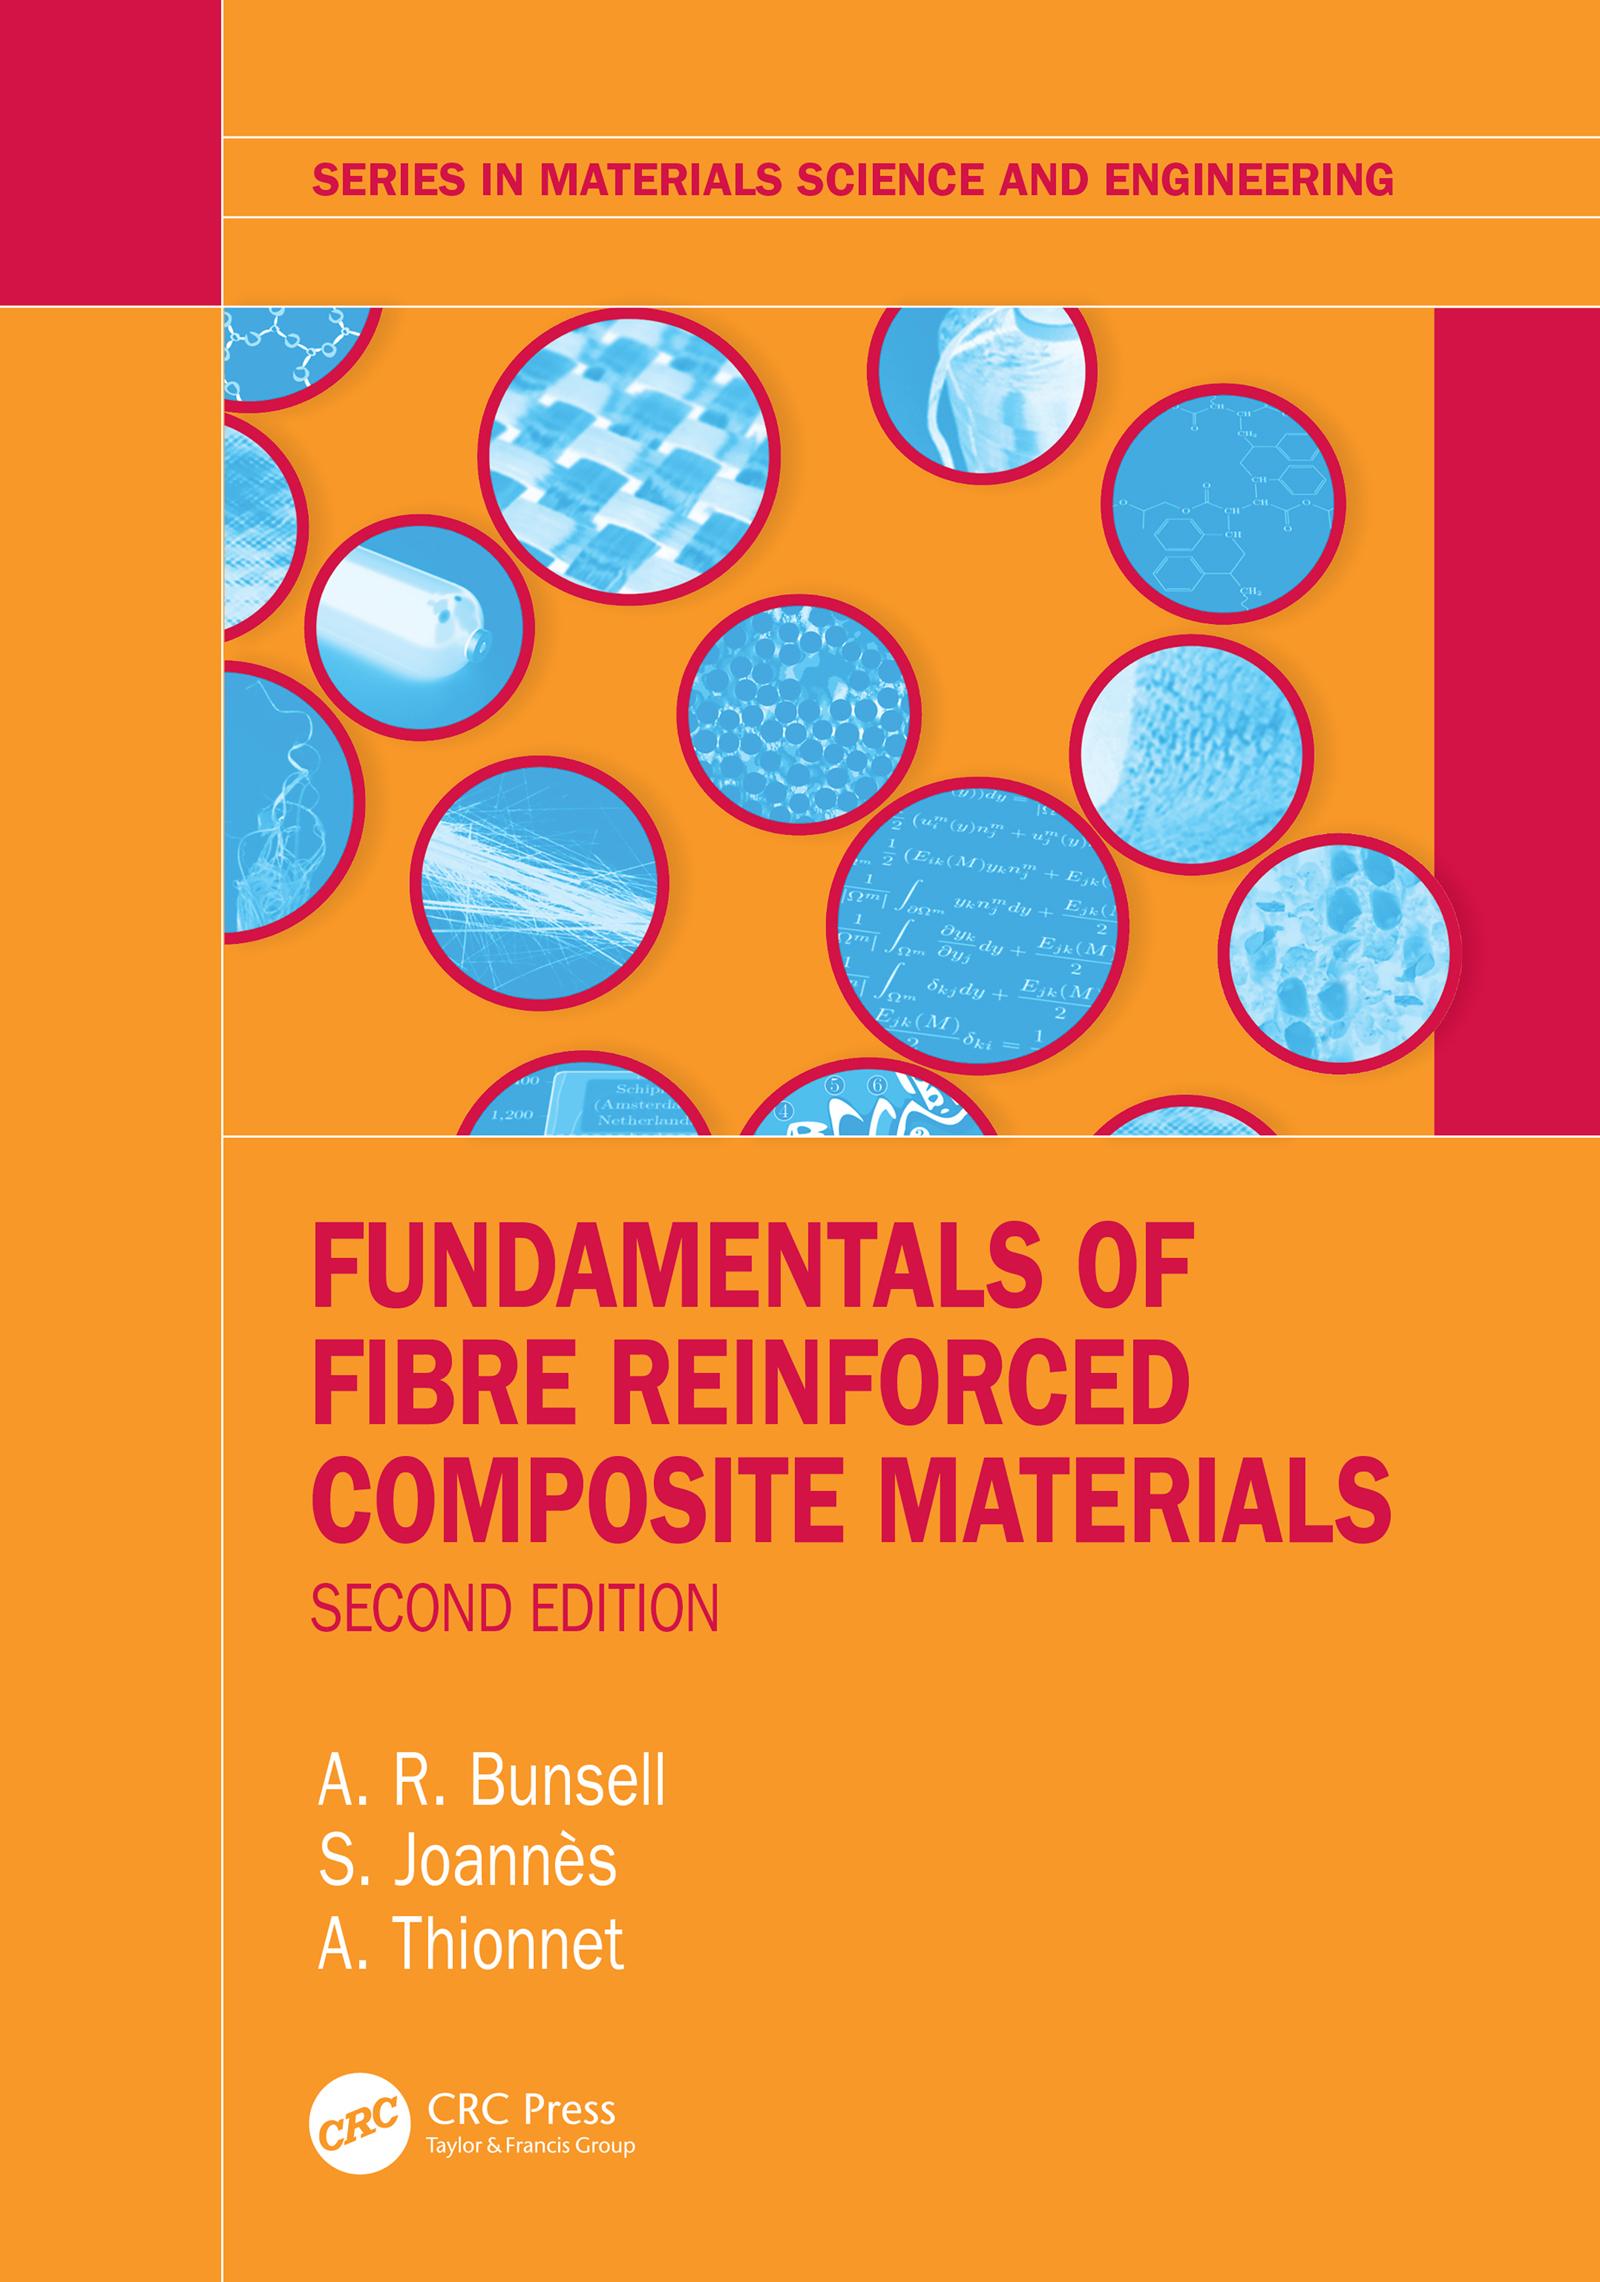 Fundamentals of Fibre Reinforced Composite Materials